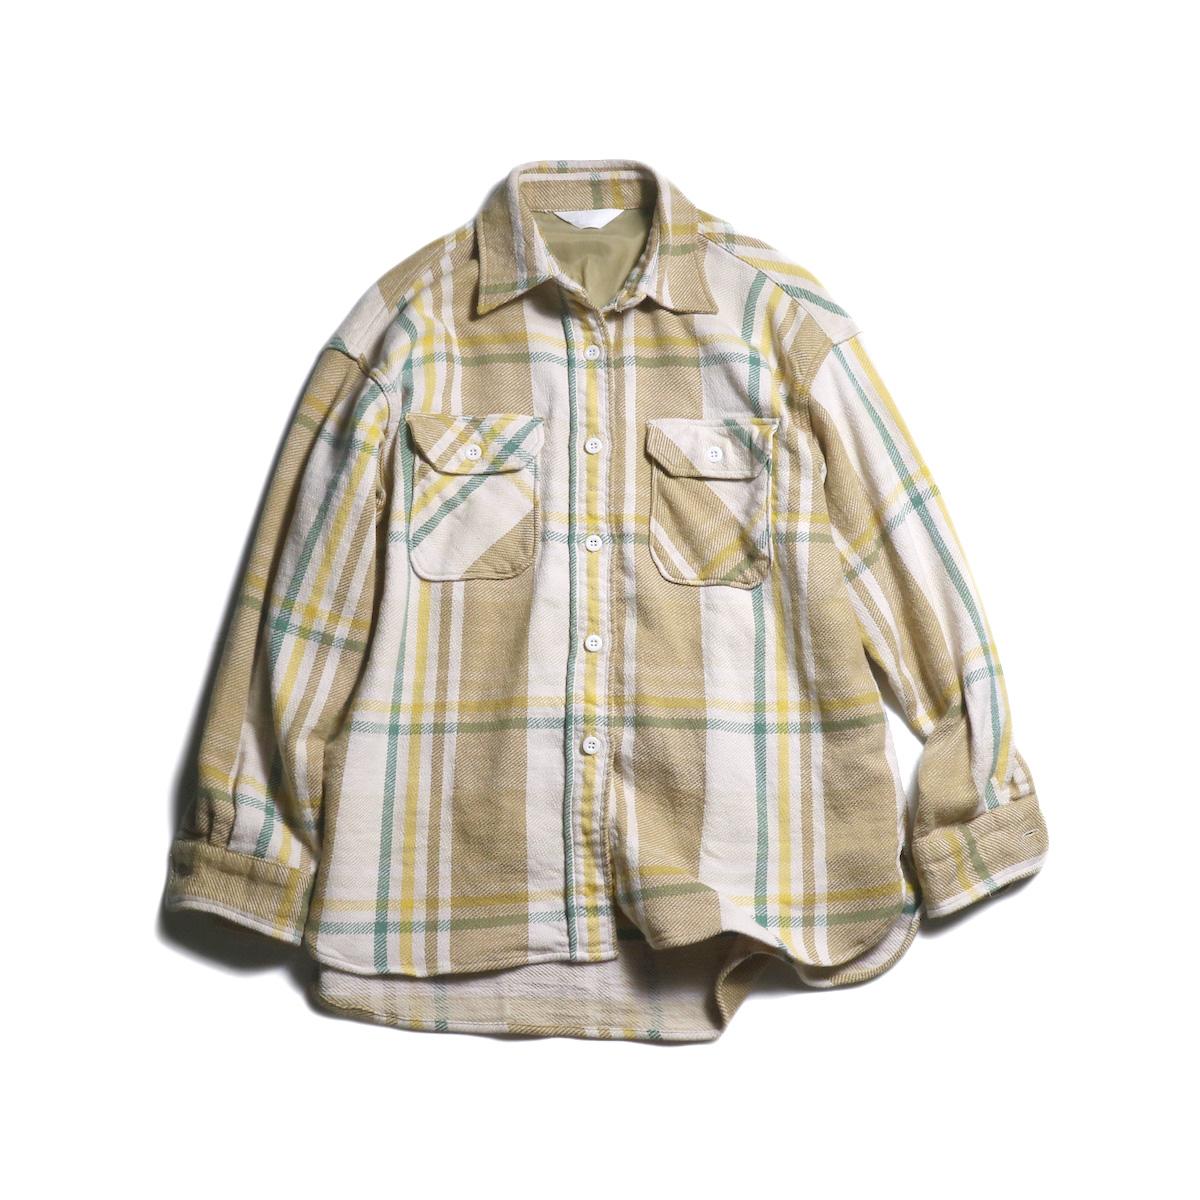 UNUSED / US1699 Check Flannel Shirt (Beige)